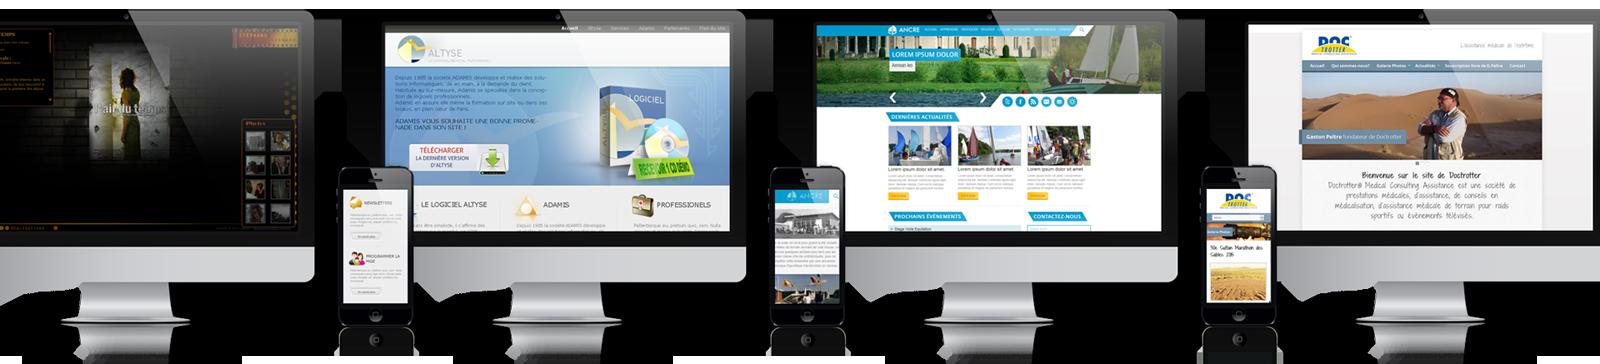 Webdesign et responsive design 02